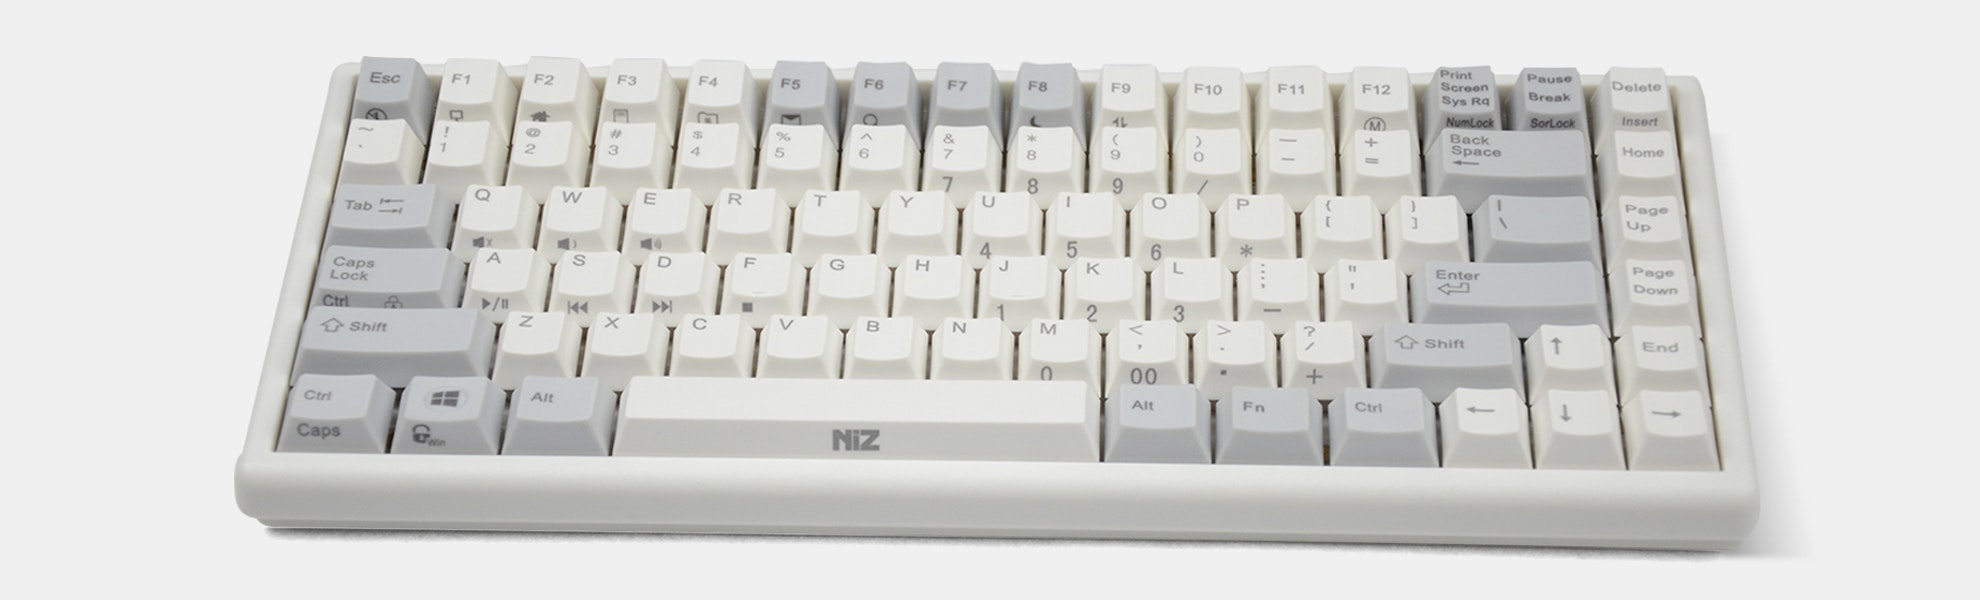 Plum84 Electro-Capacitive Keyboard